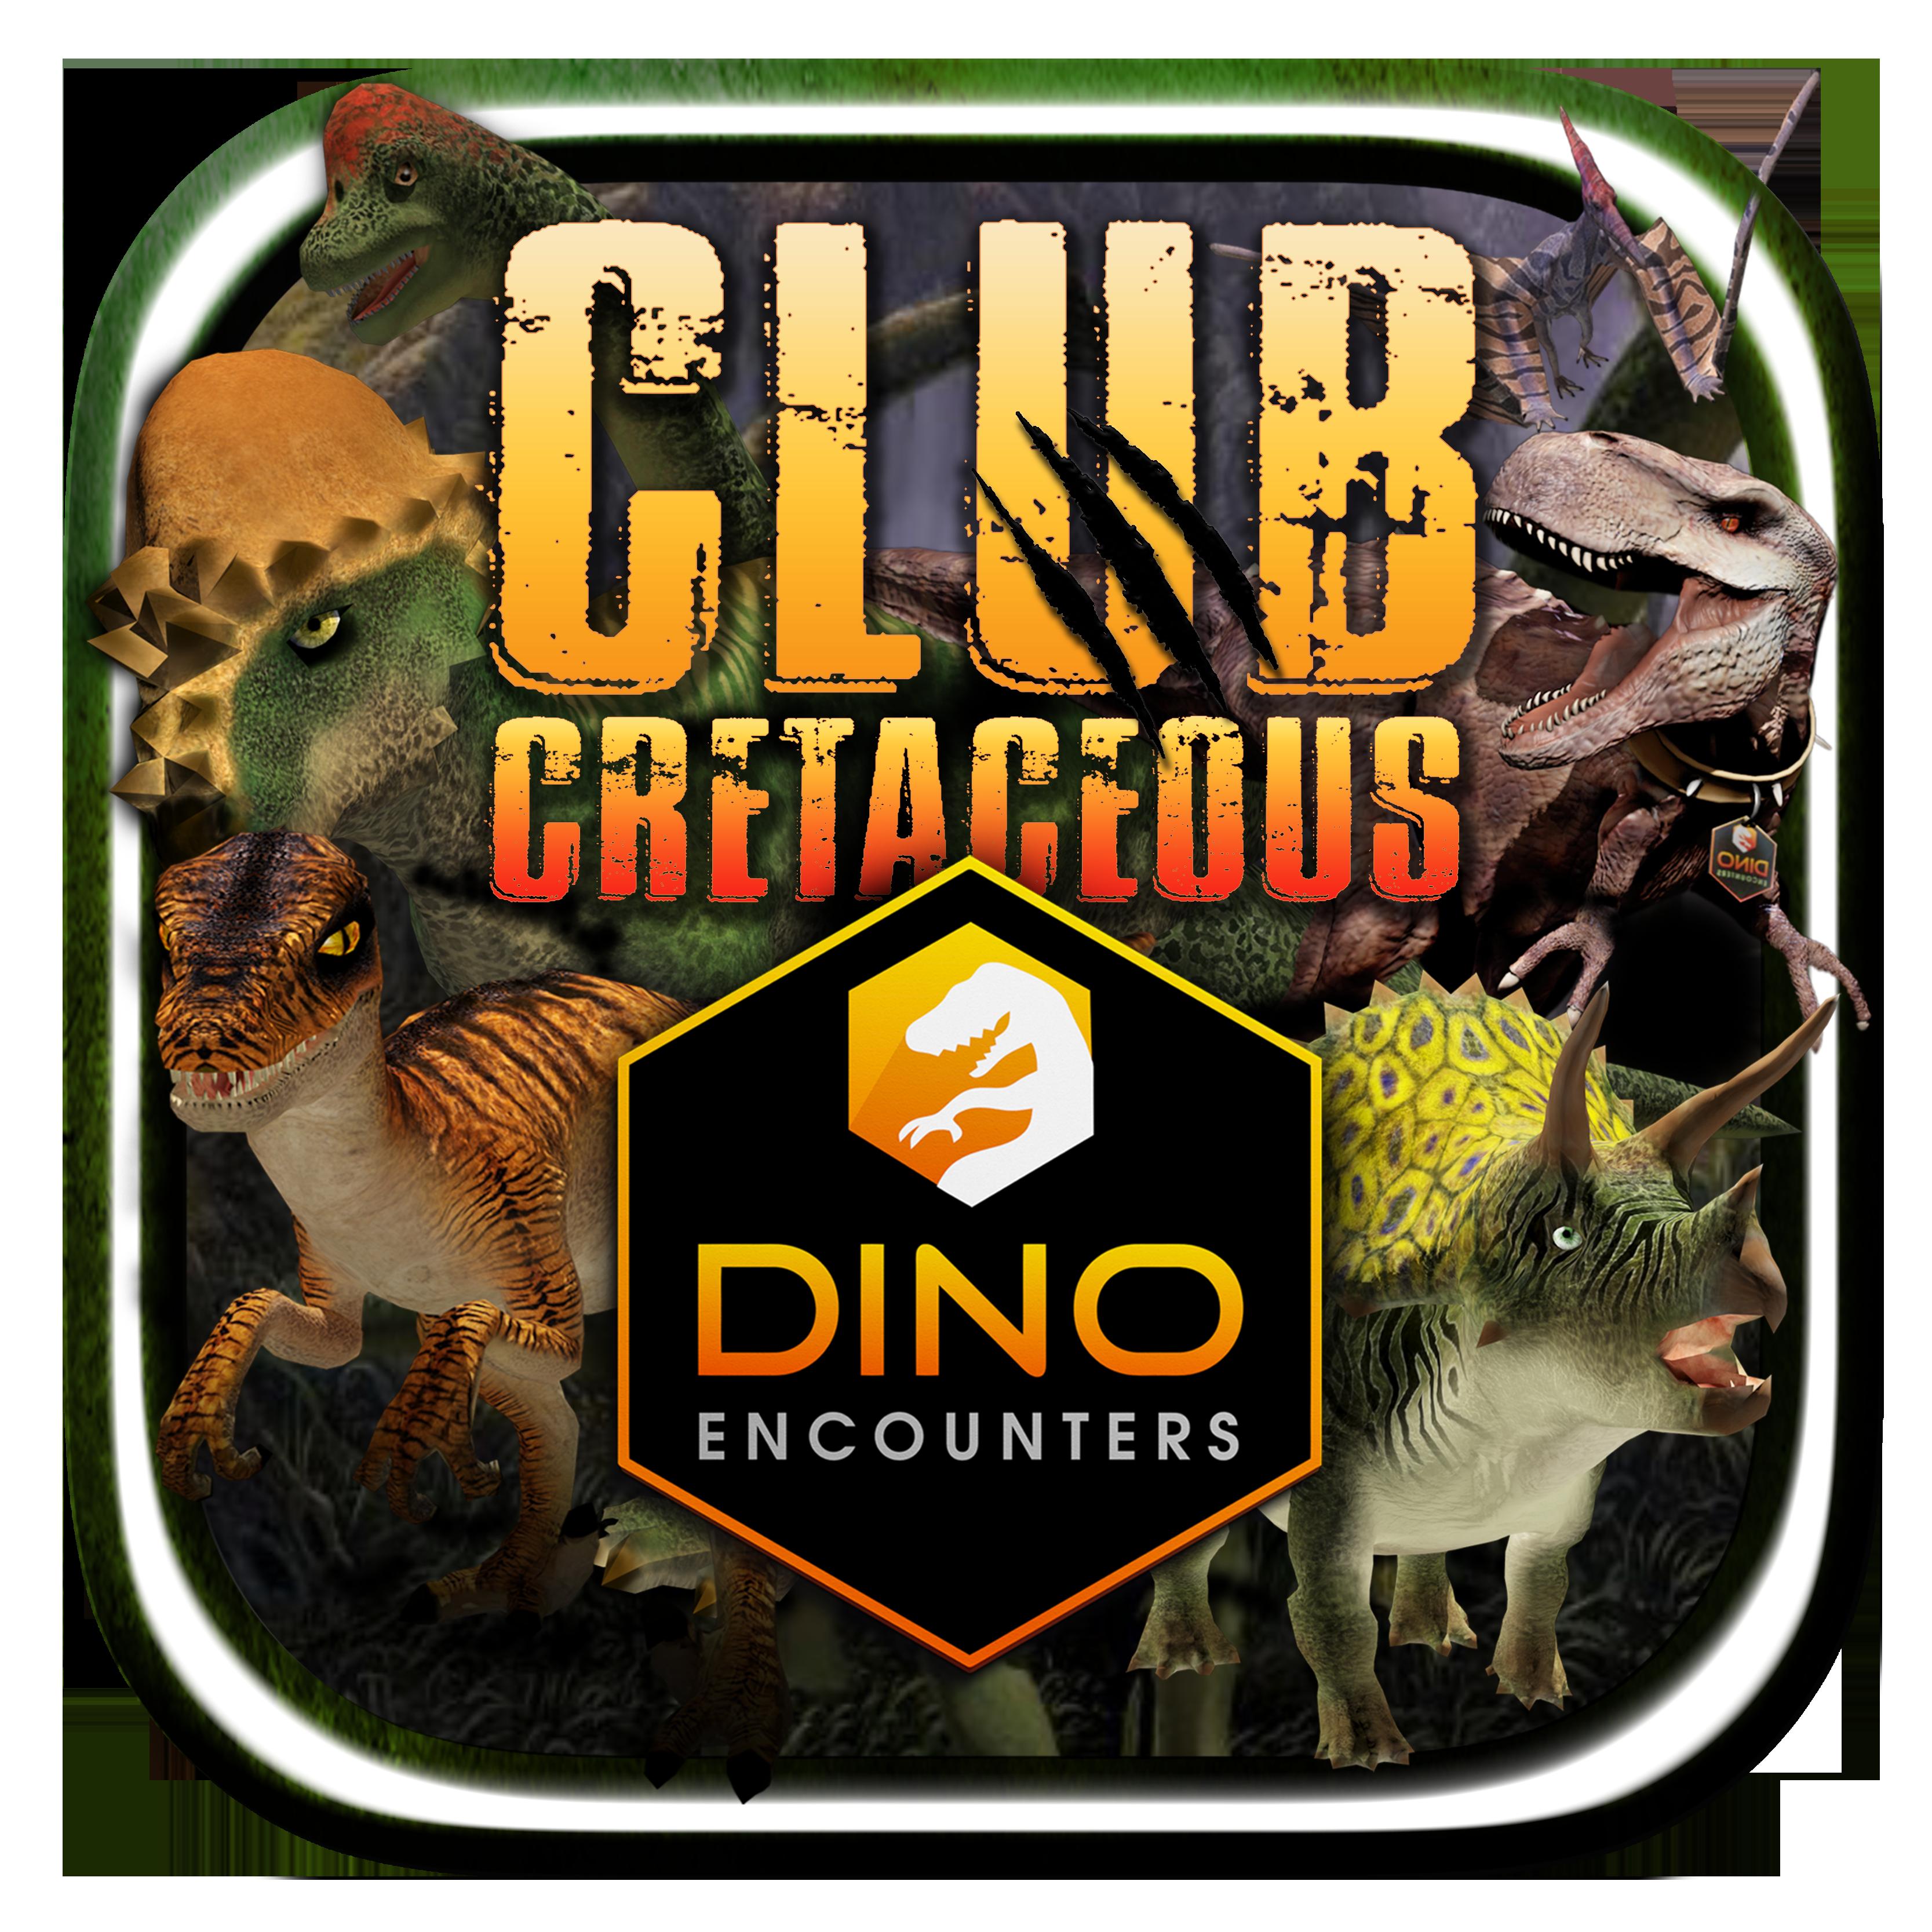 Club Cretaceous - Dino Encounters Kids